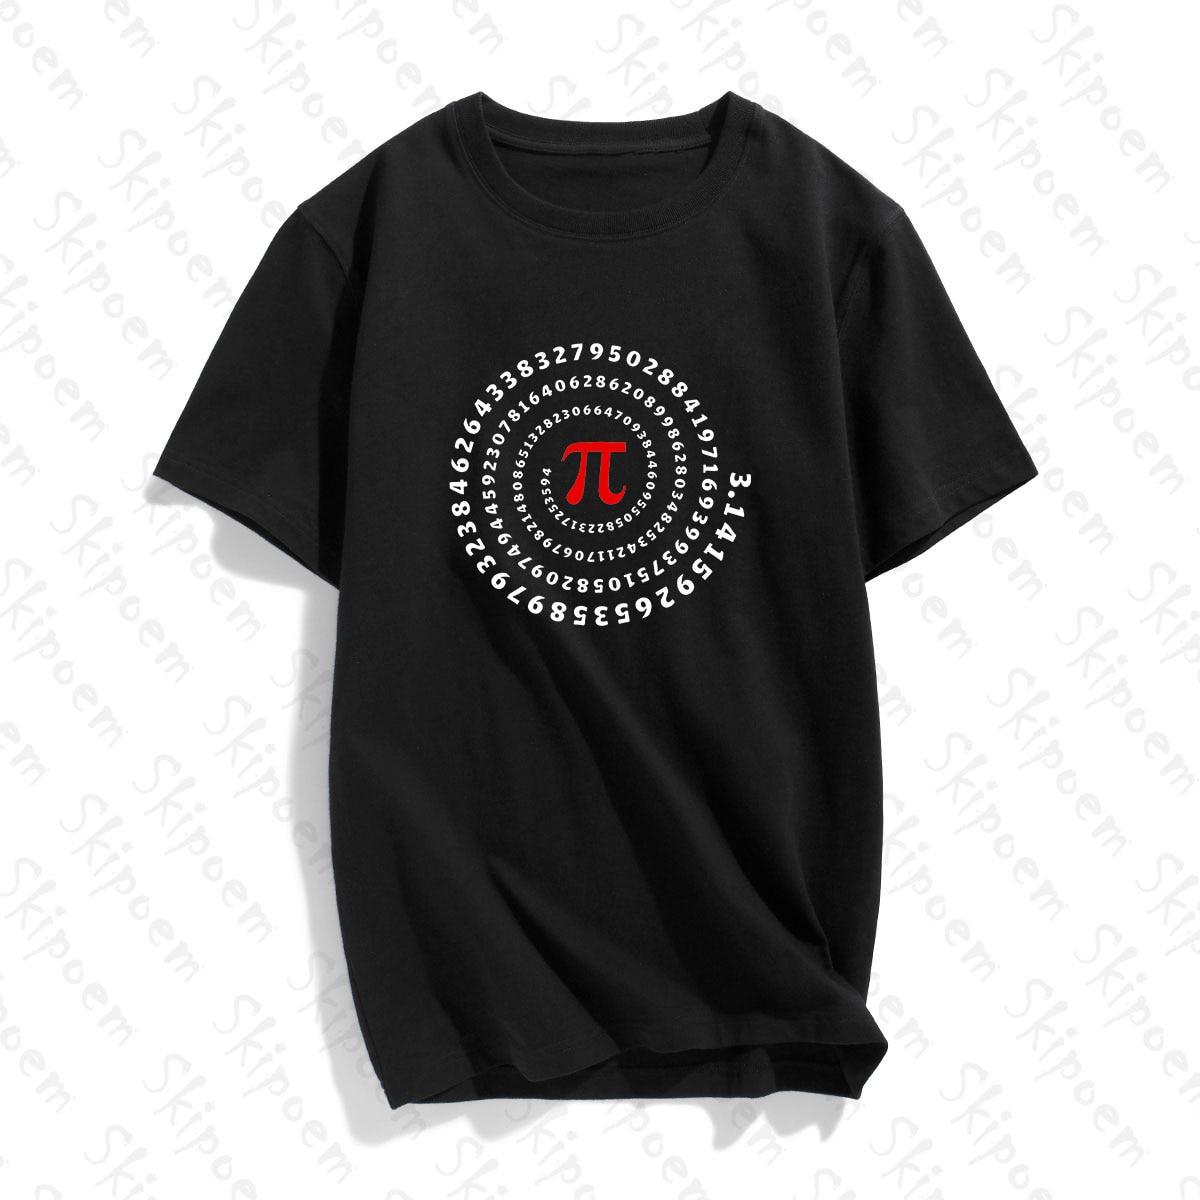 Mathematical Arts T Shirt Women Tumblr Gothic Kawaii Korean Style Punk Cotton Plus Size Short Sleeve Clothes Tee Shirt Femme